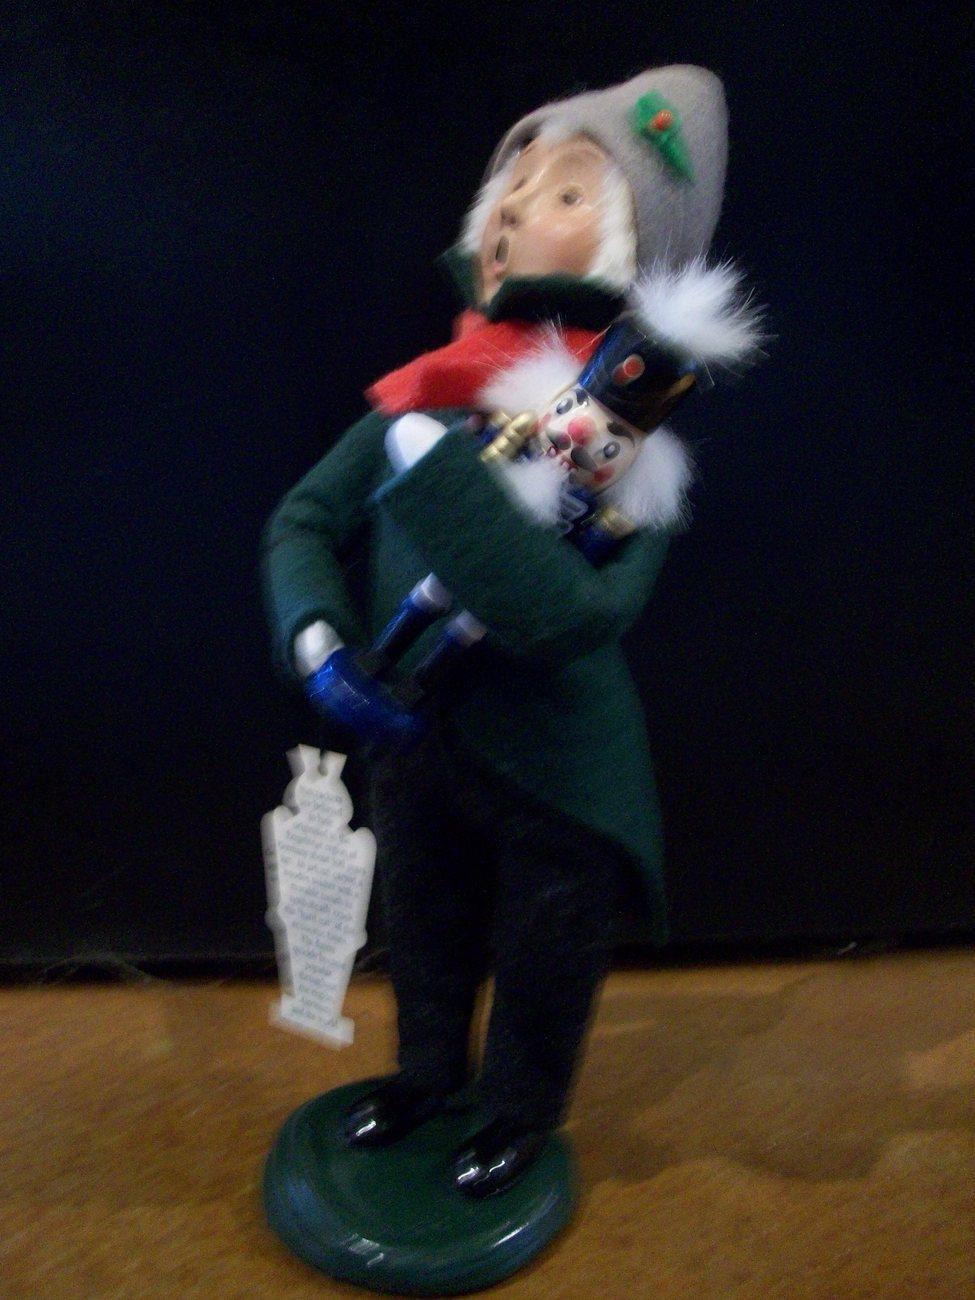 Byers Choice Caroler, Boy Holding Nutcracker, Green Coat,  New